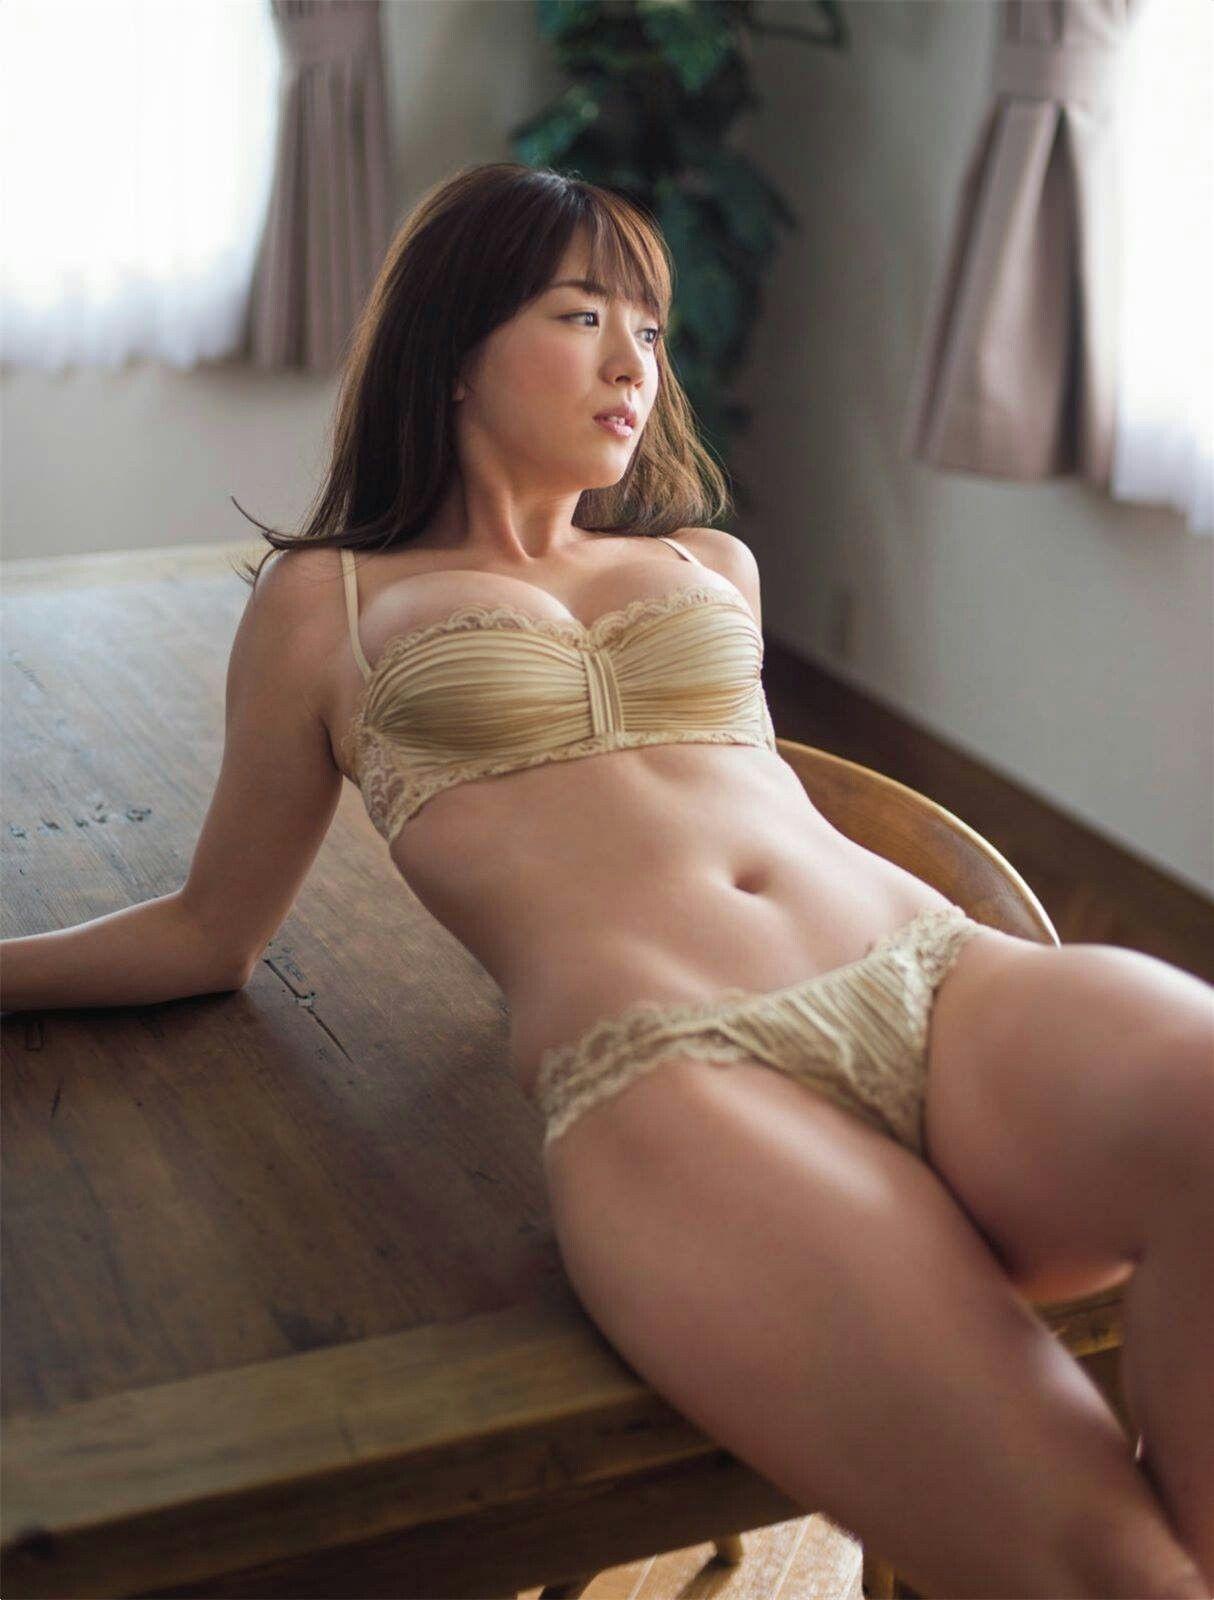 Asian pantie links